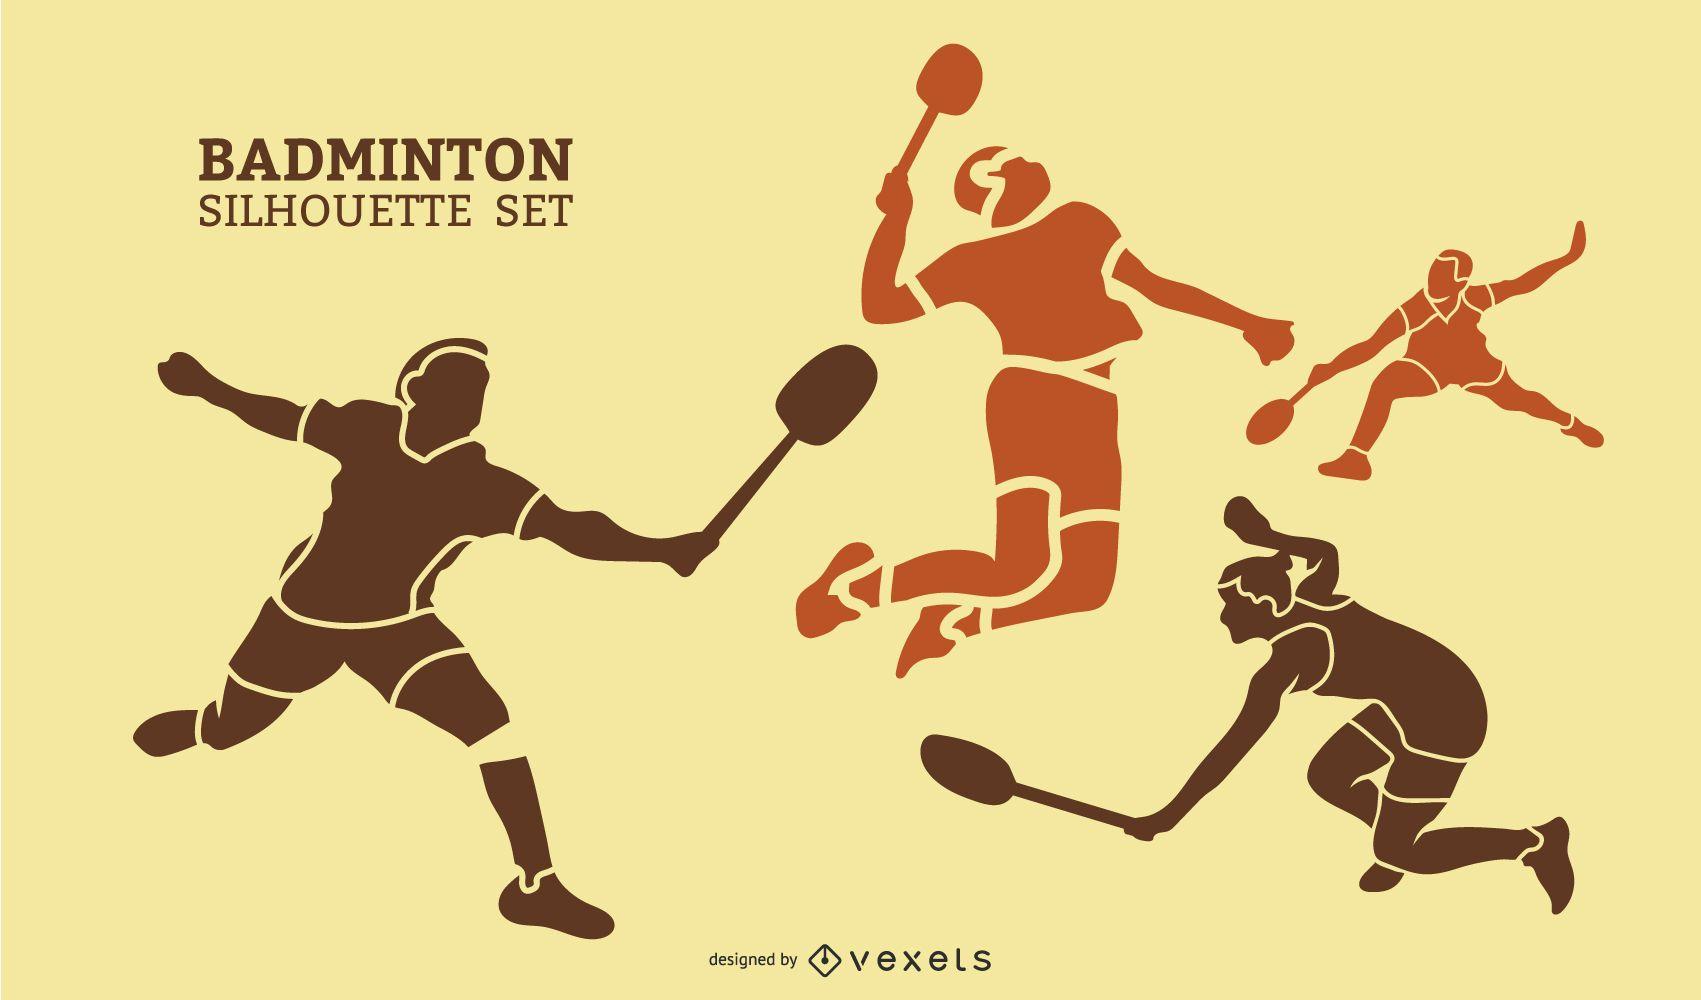 Badminton players silhouette set